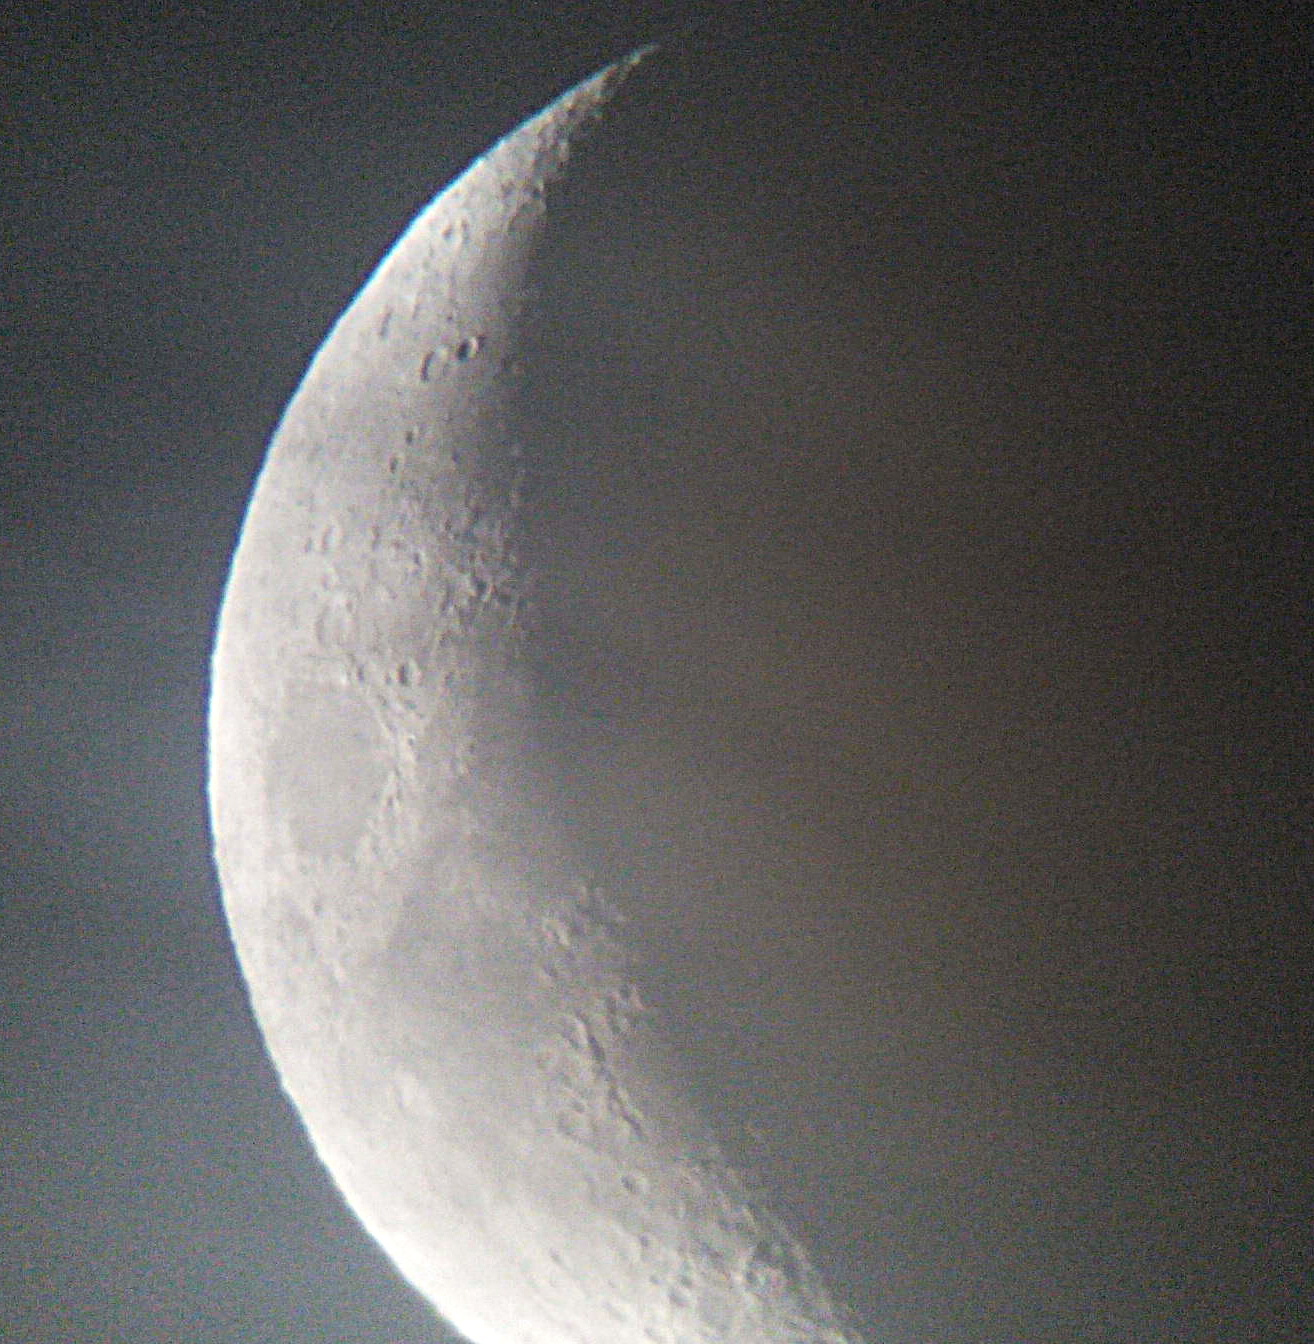 moon_20181112_194758.jpg.ea822dd6d4f154e85d974968d08d93e3.jpg